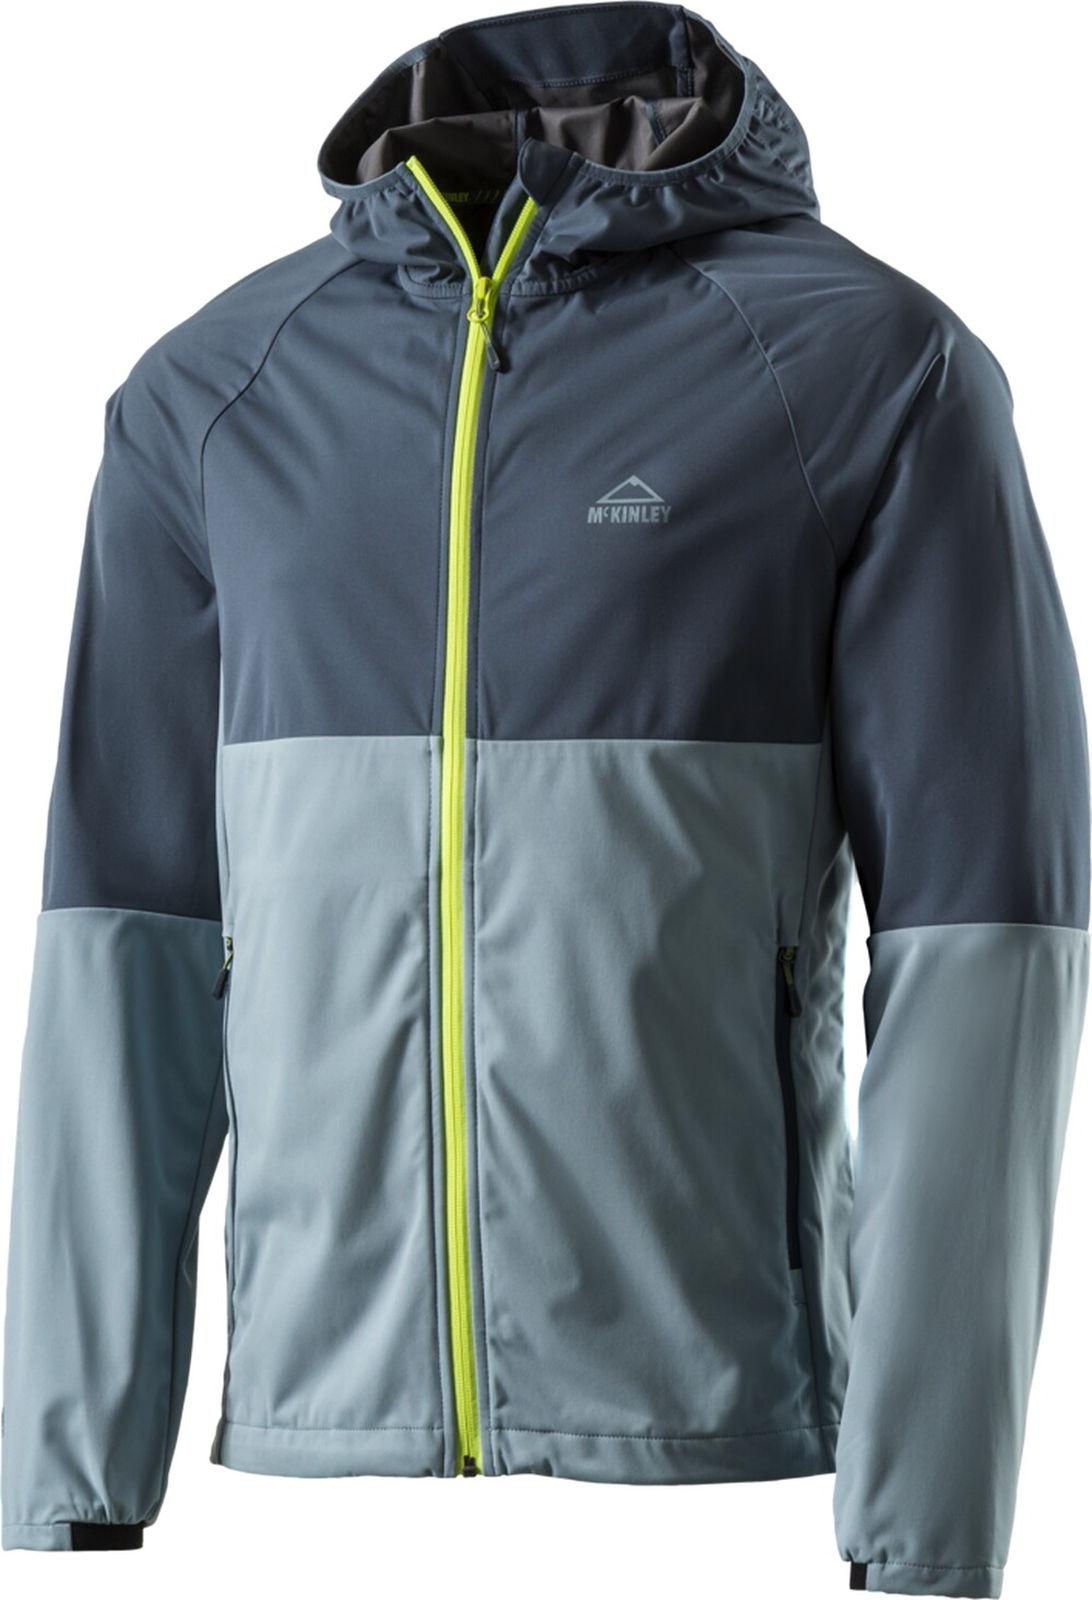 McKinley Herren-Wander-Trekking-Softshell-Jacke Clifton blau rot